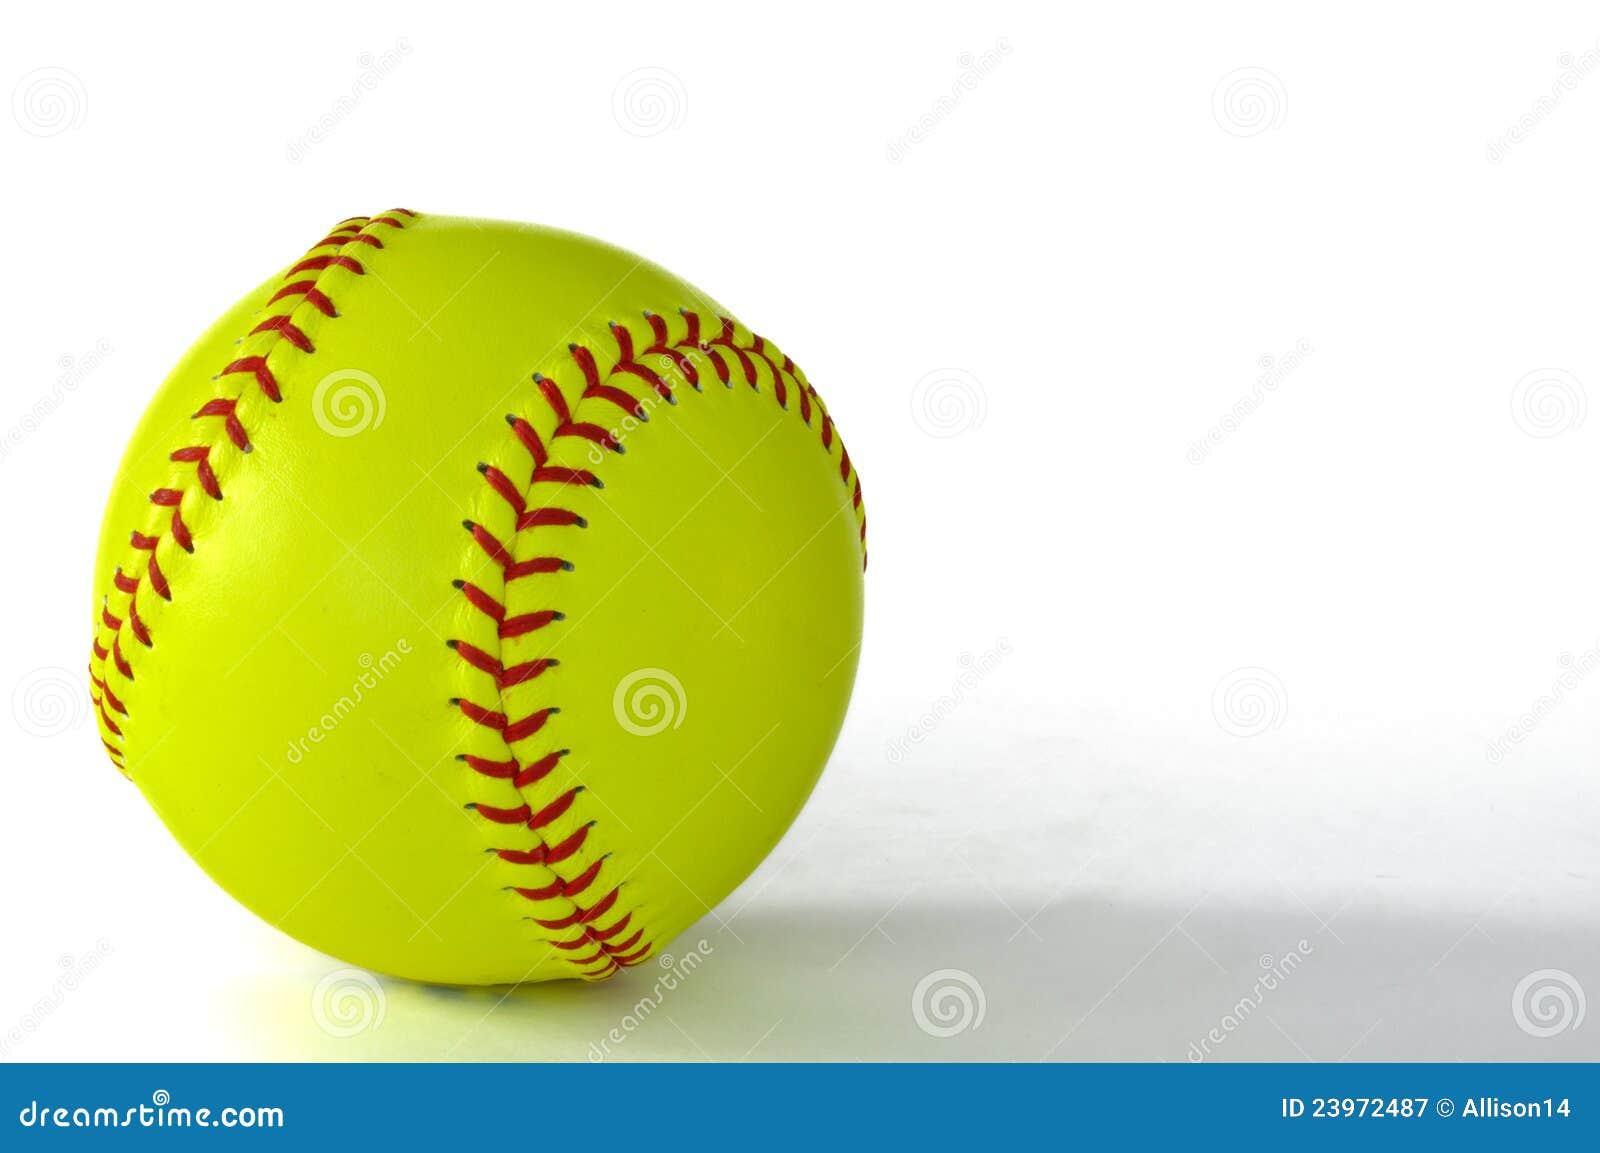 Yellow Softball Royalty Free Stock Photography - Image: 23972487